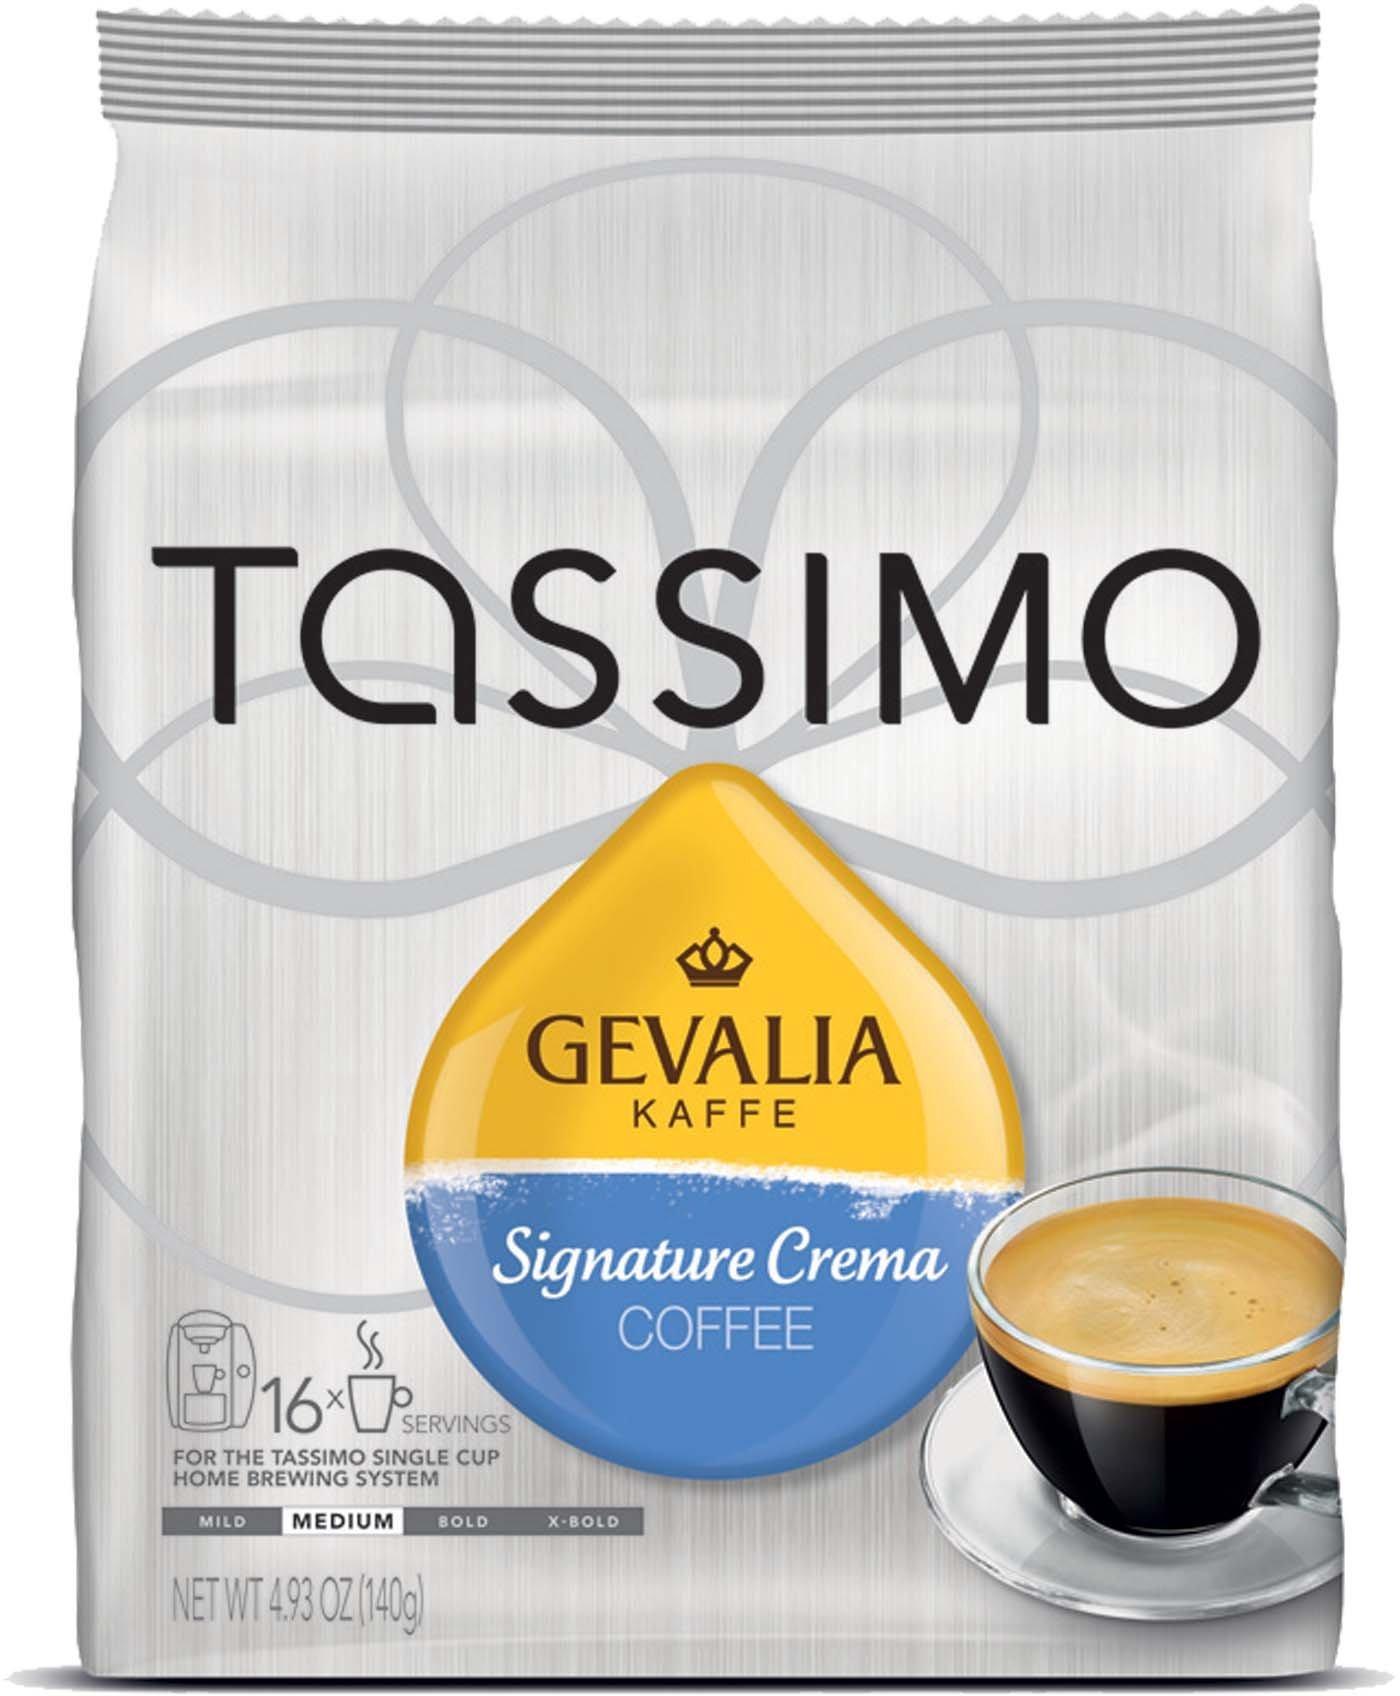 Tassimo Gevalia Kaffe Signature Crema Coffee T-Discs 3 pack (48 Count) by Gevalia